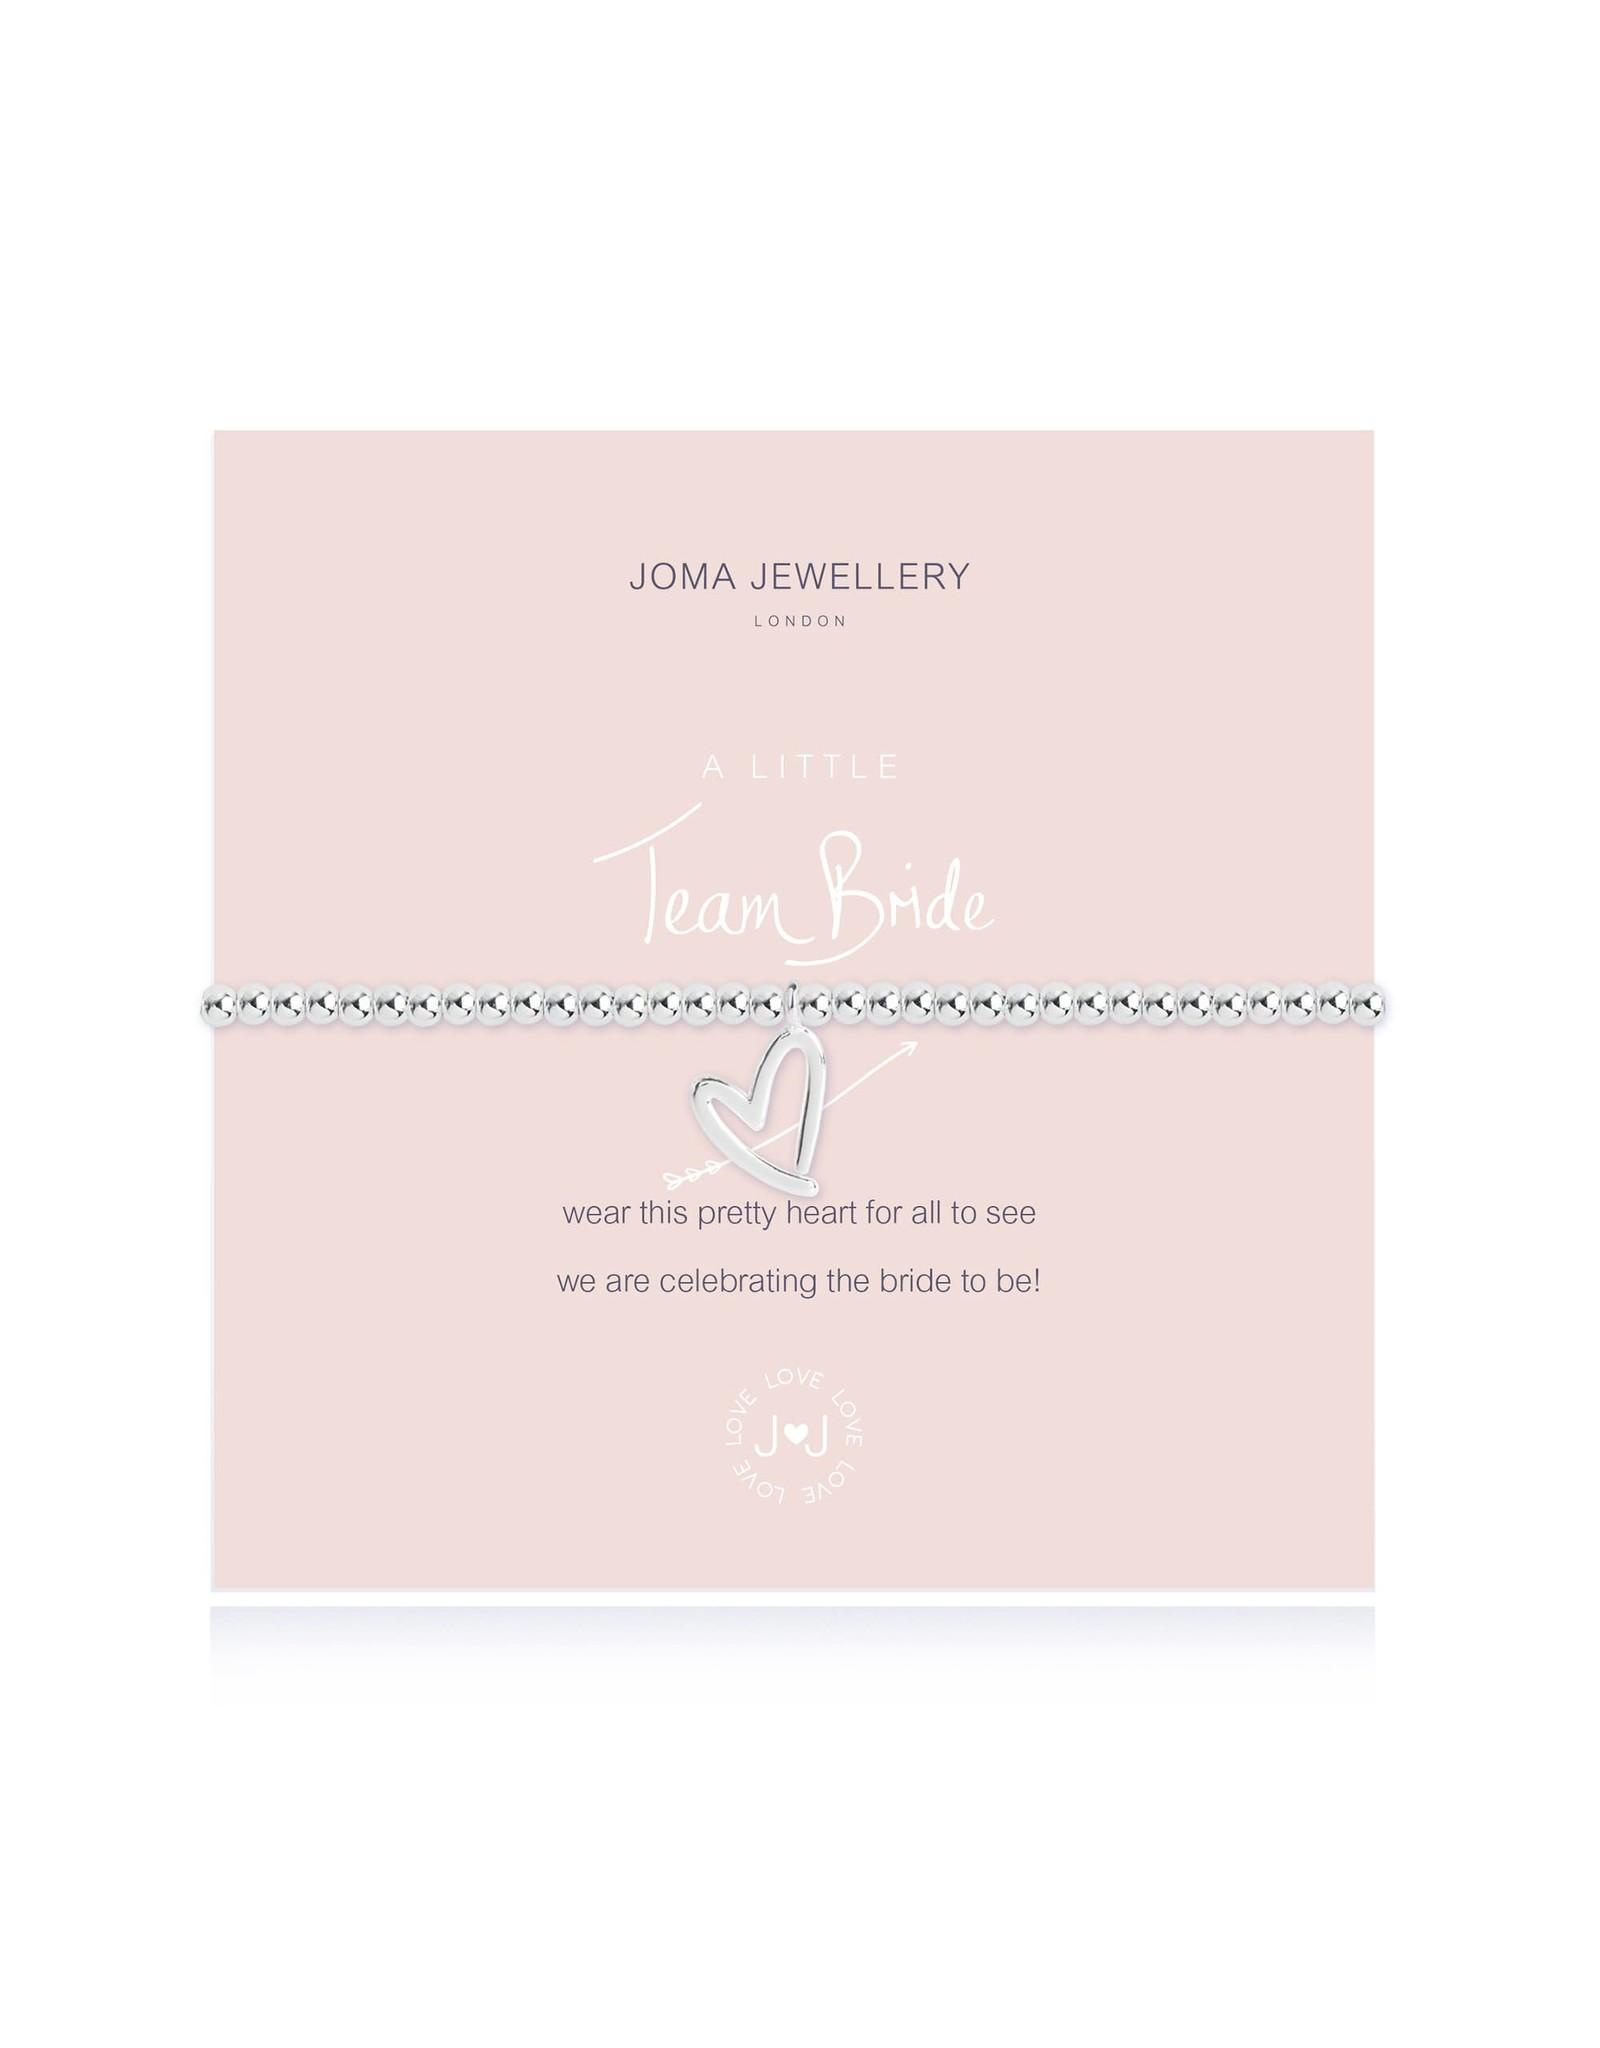 Joma Jewellery A Little - Team Bride